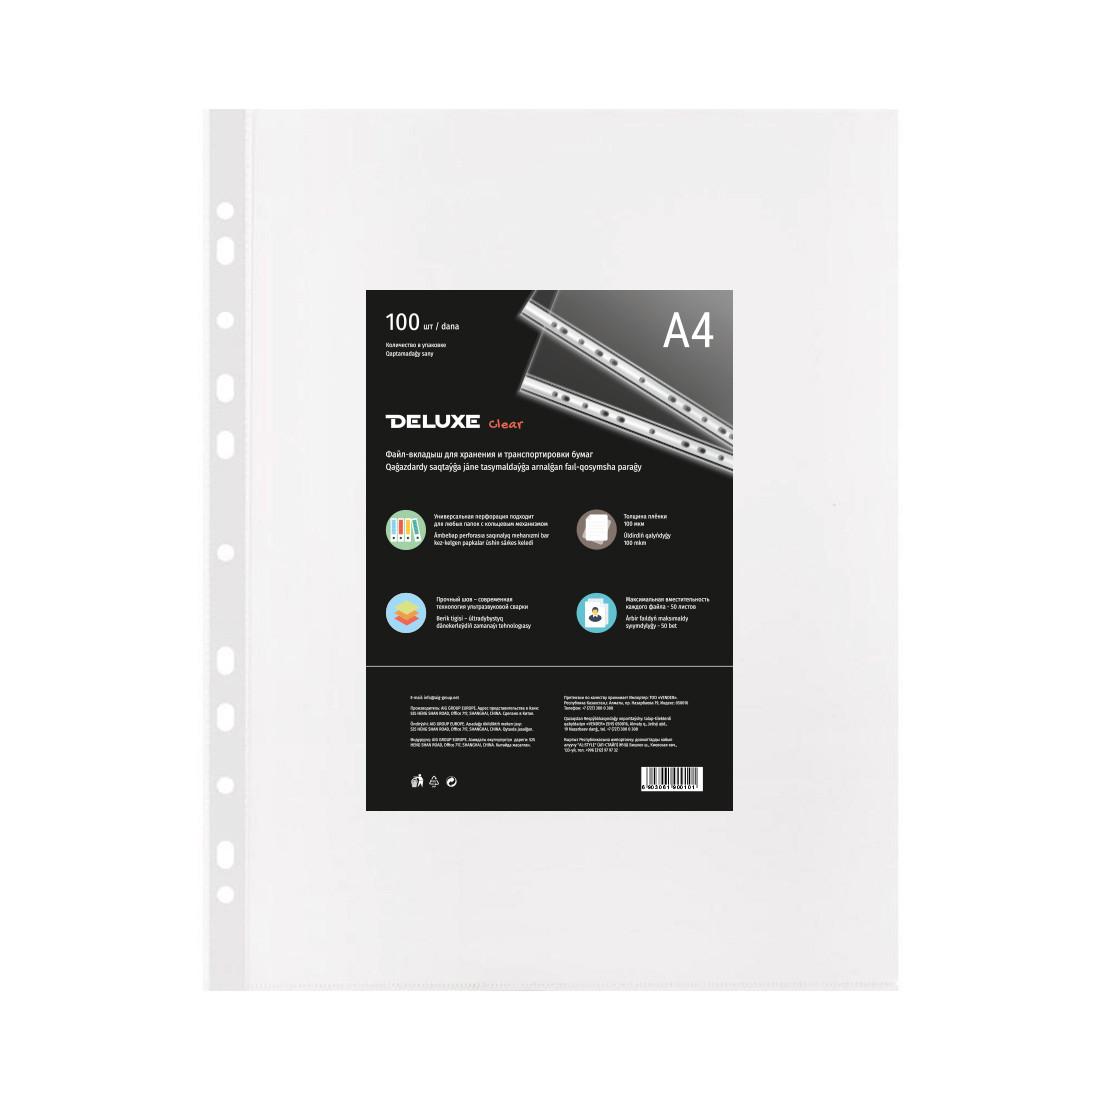 Файл-вкладыш пластиковый Deluxe Clear A4100M (A4, Прозрачный)